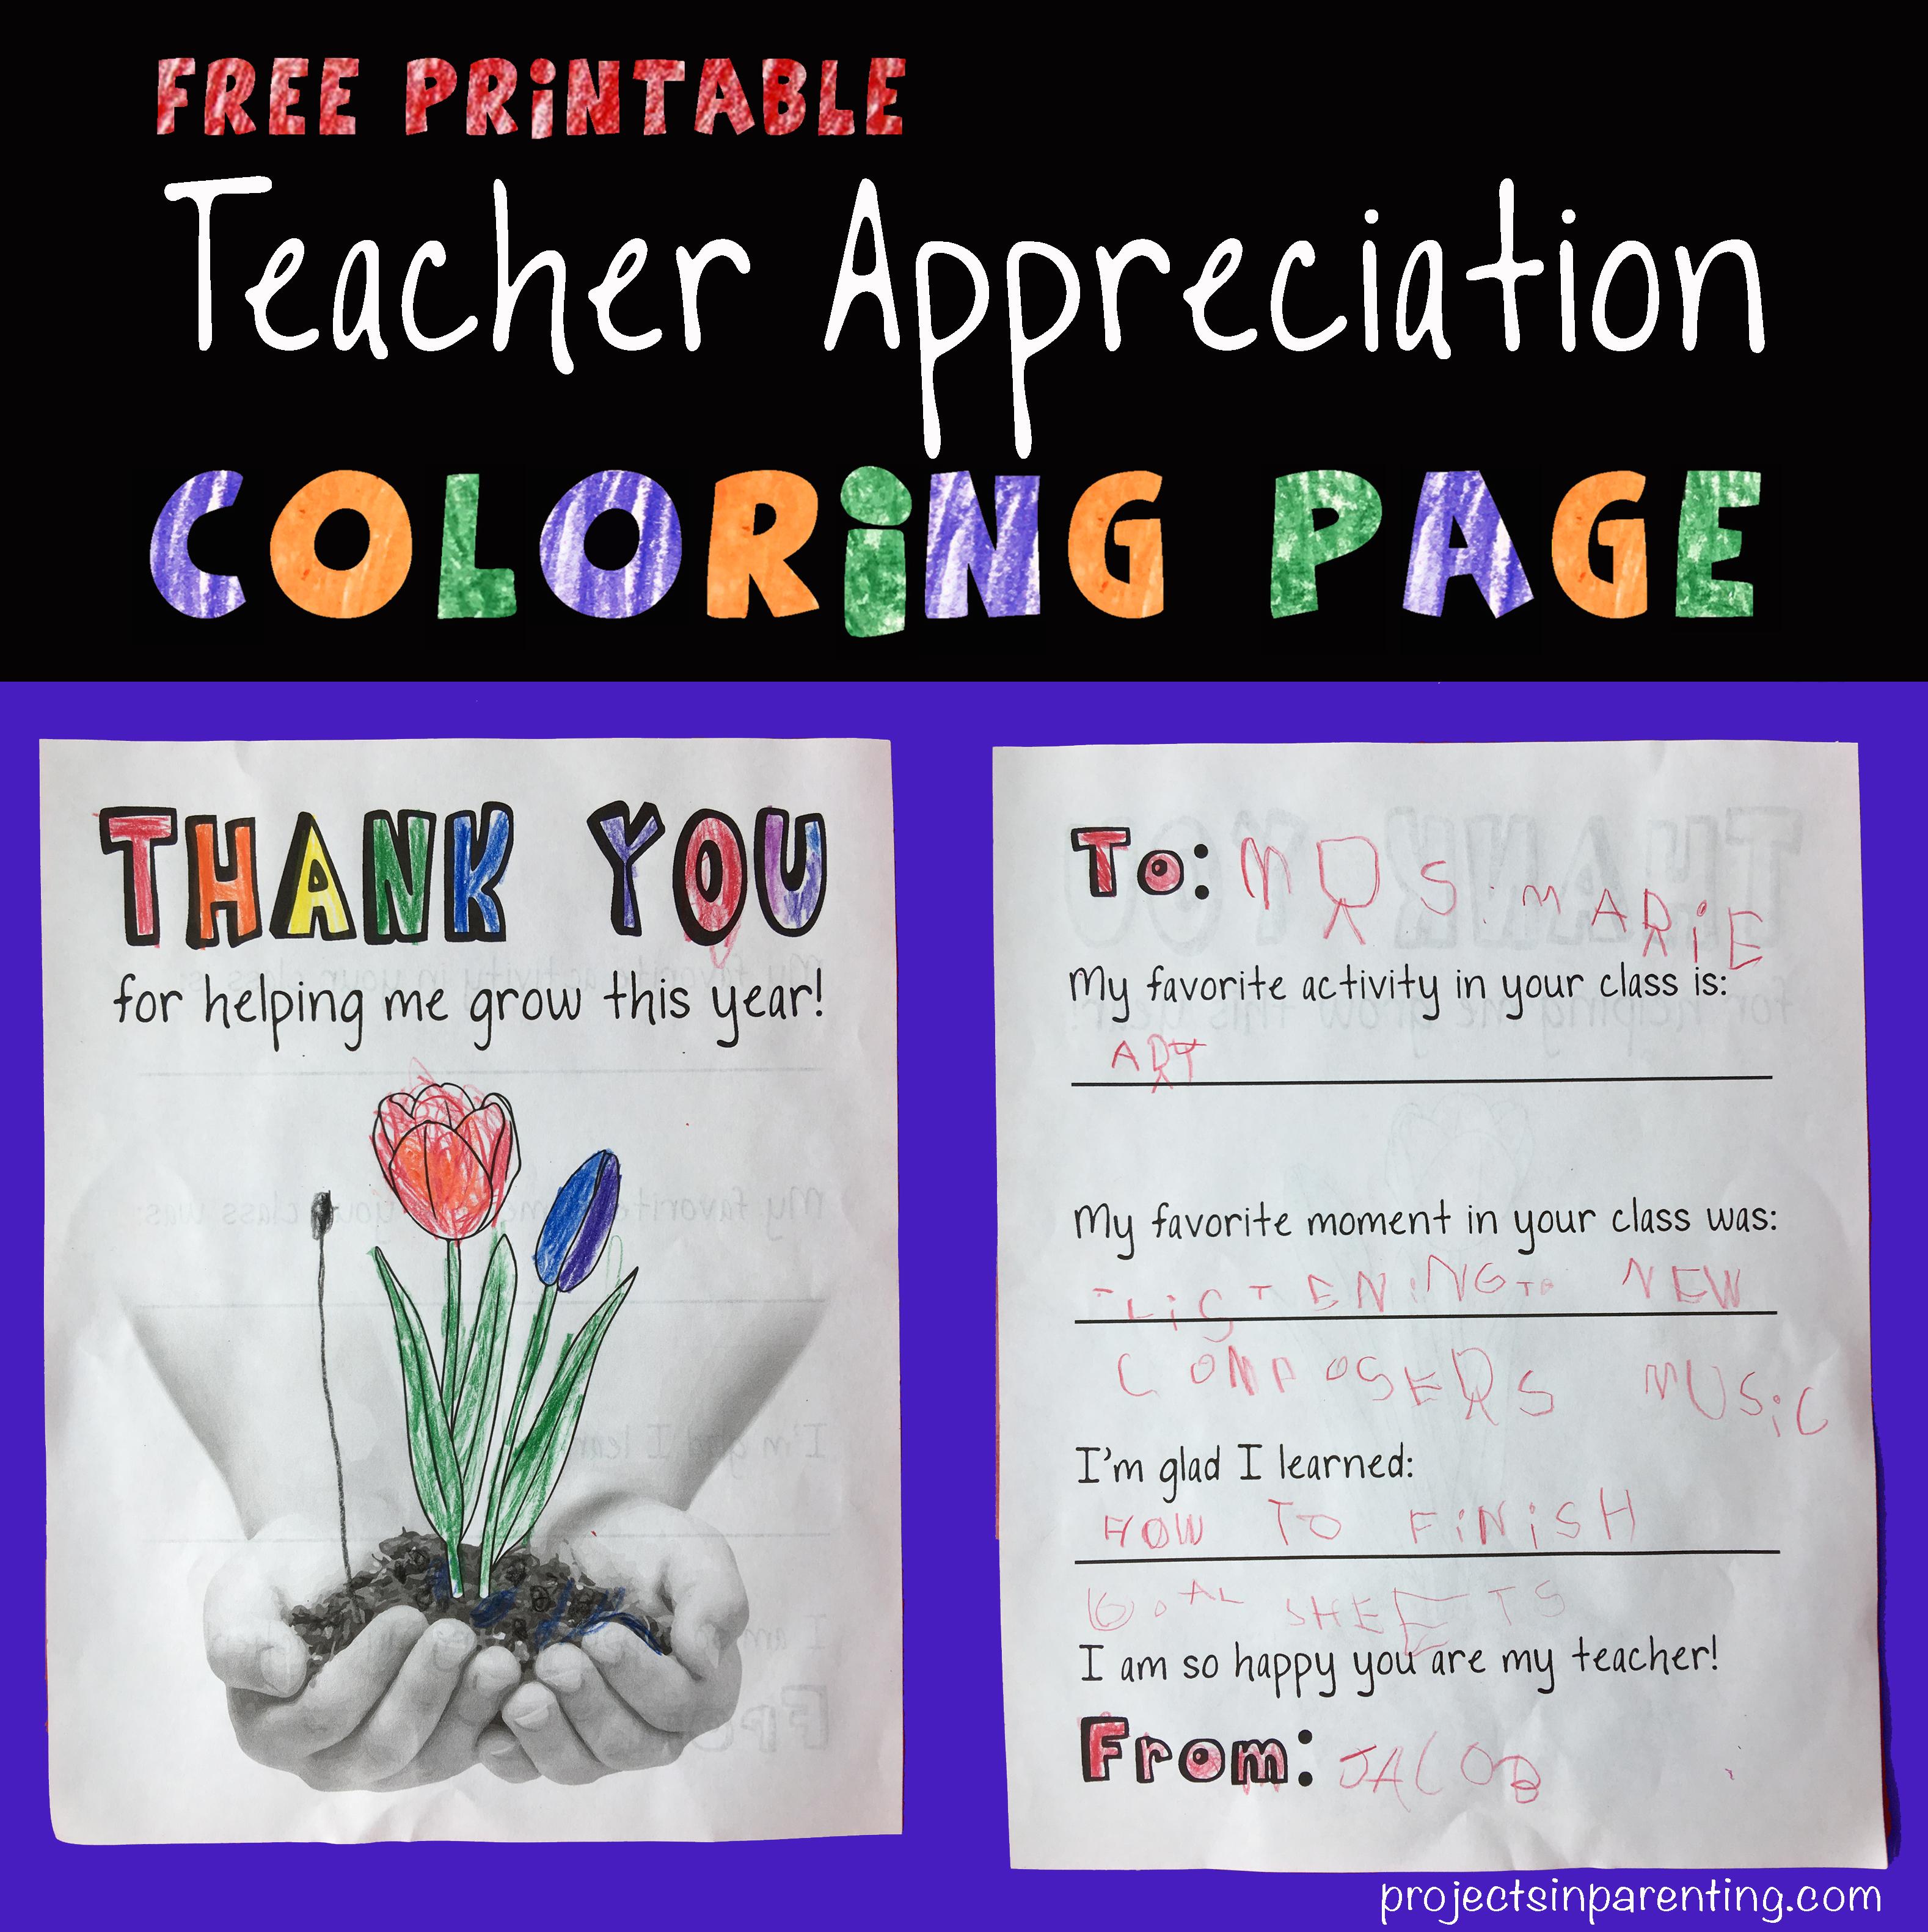 Teacher Appreciation Coloring Page